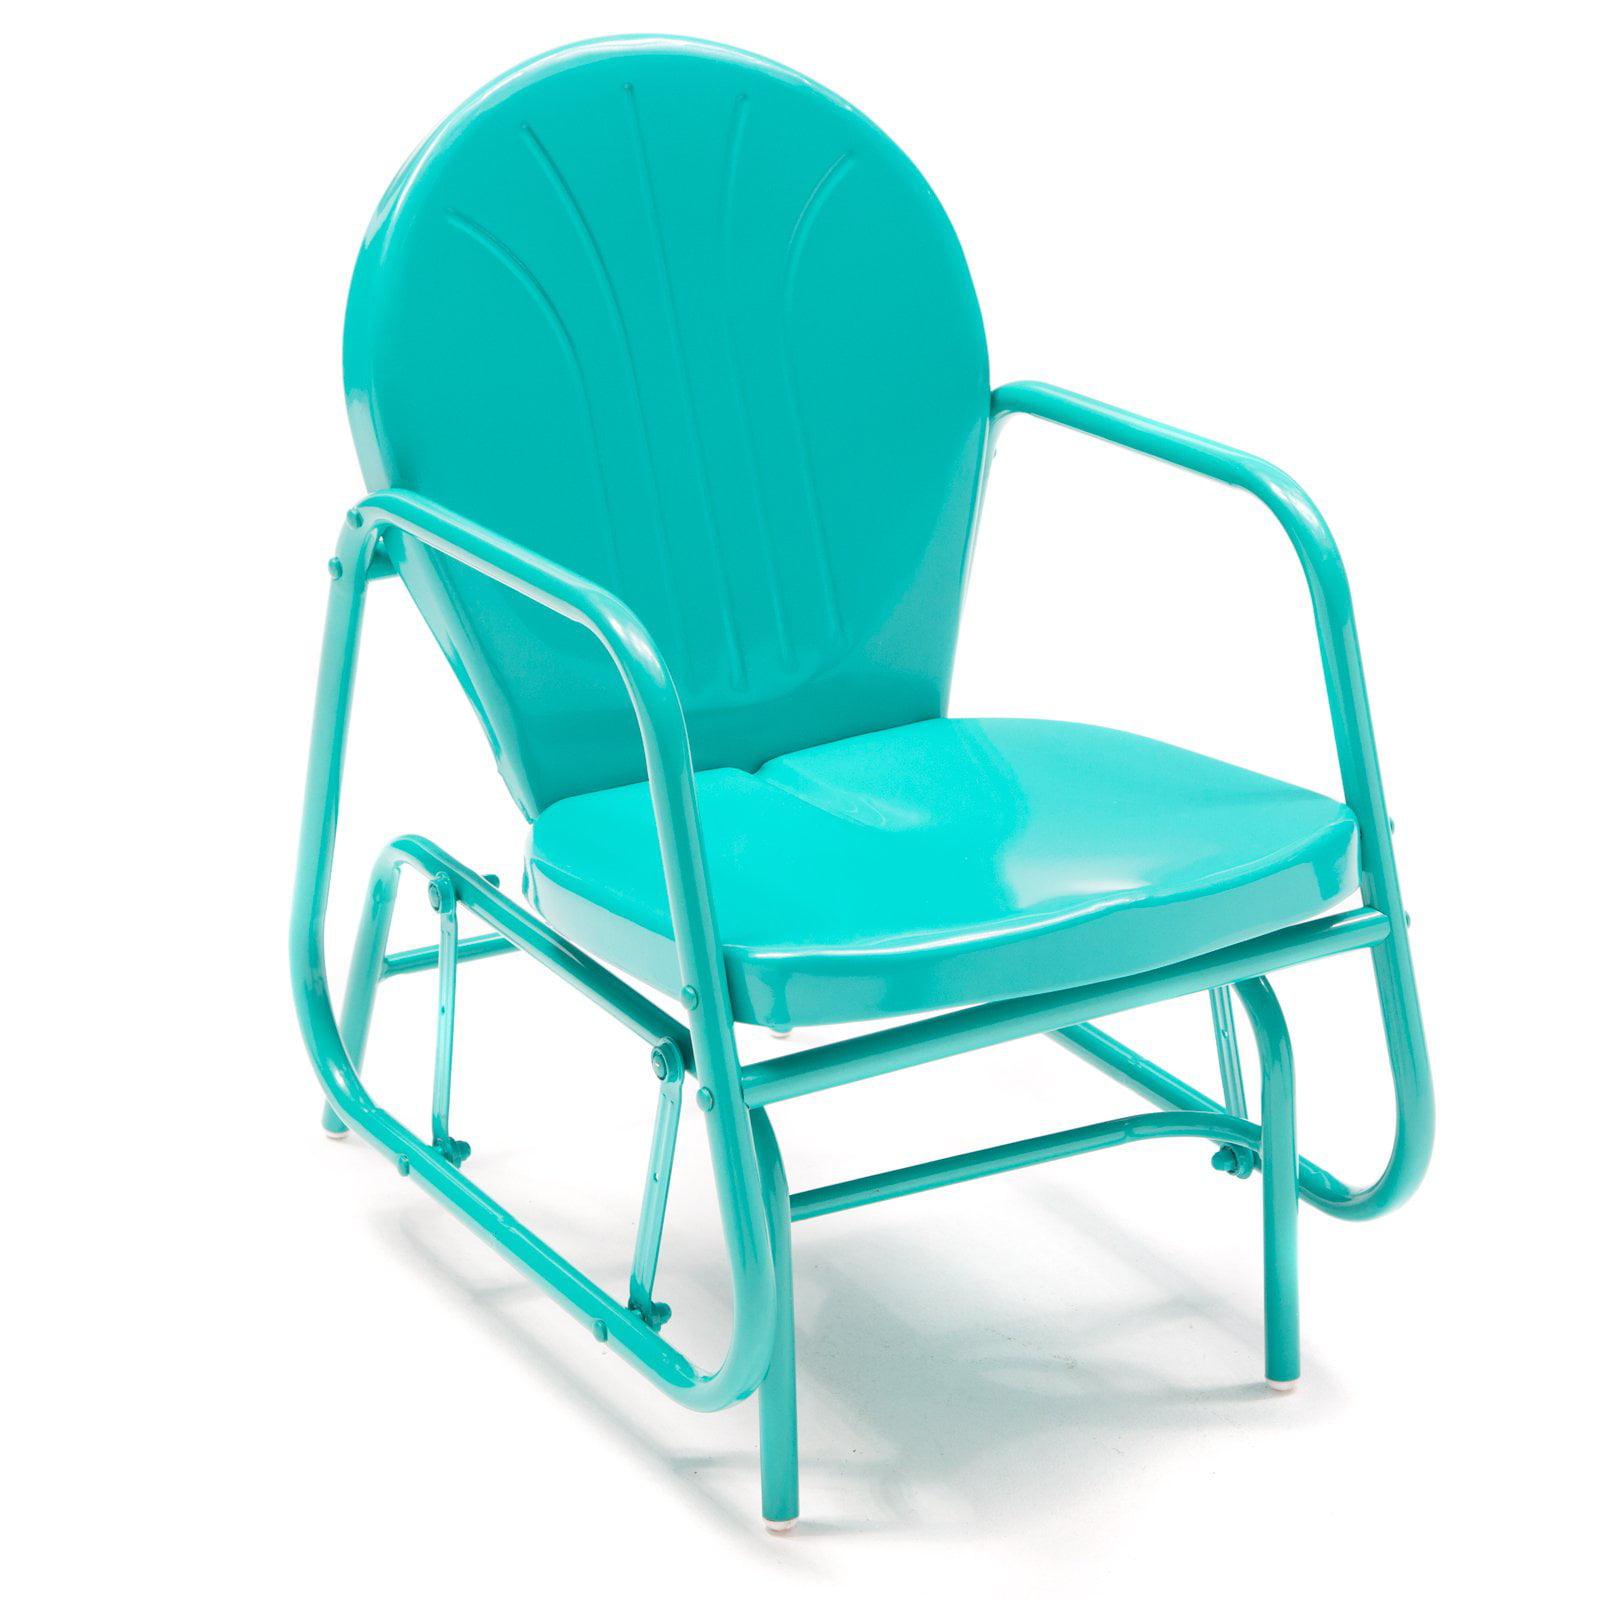 Retro Outdoor Chair coral coast vintage retro outdoor glider chair - walmart